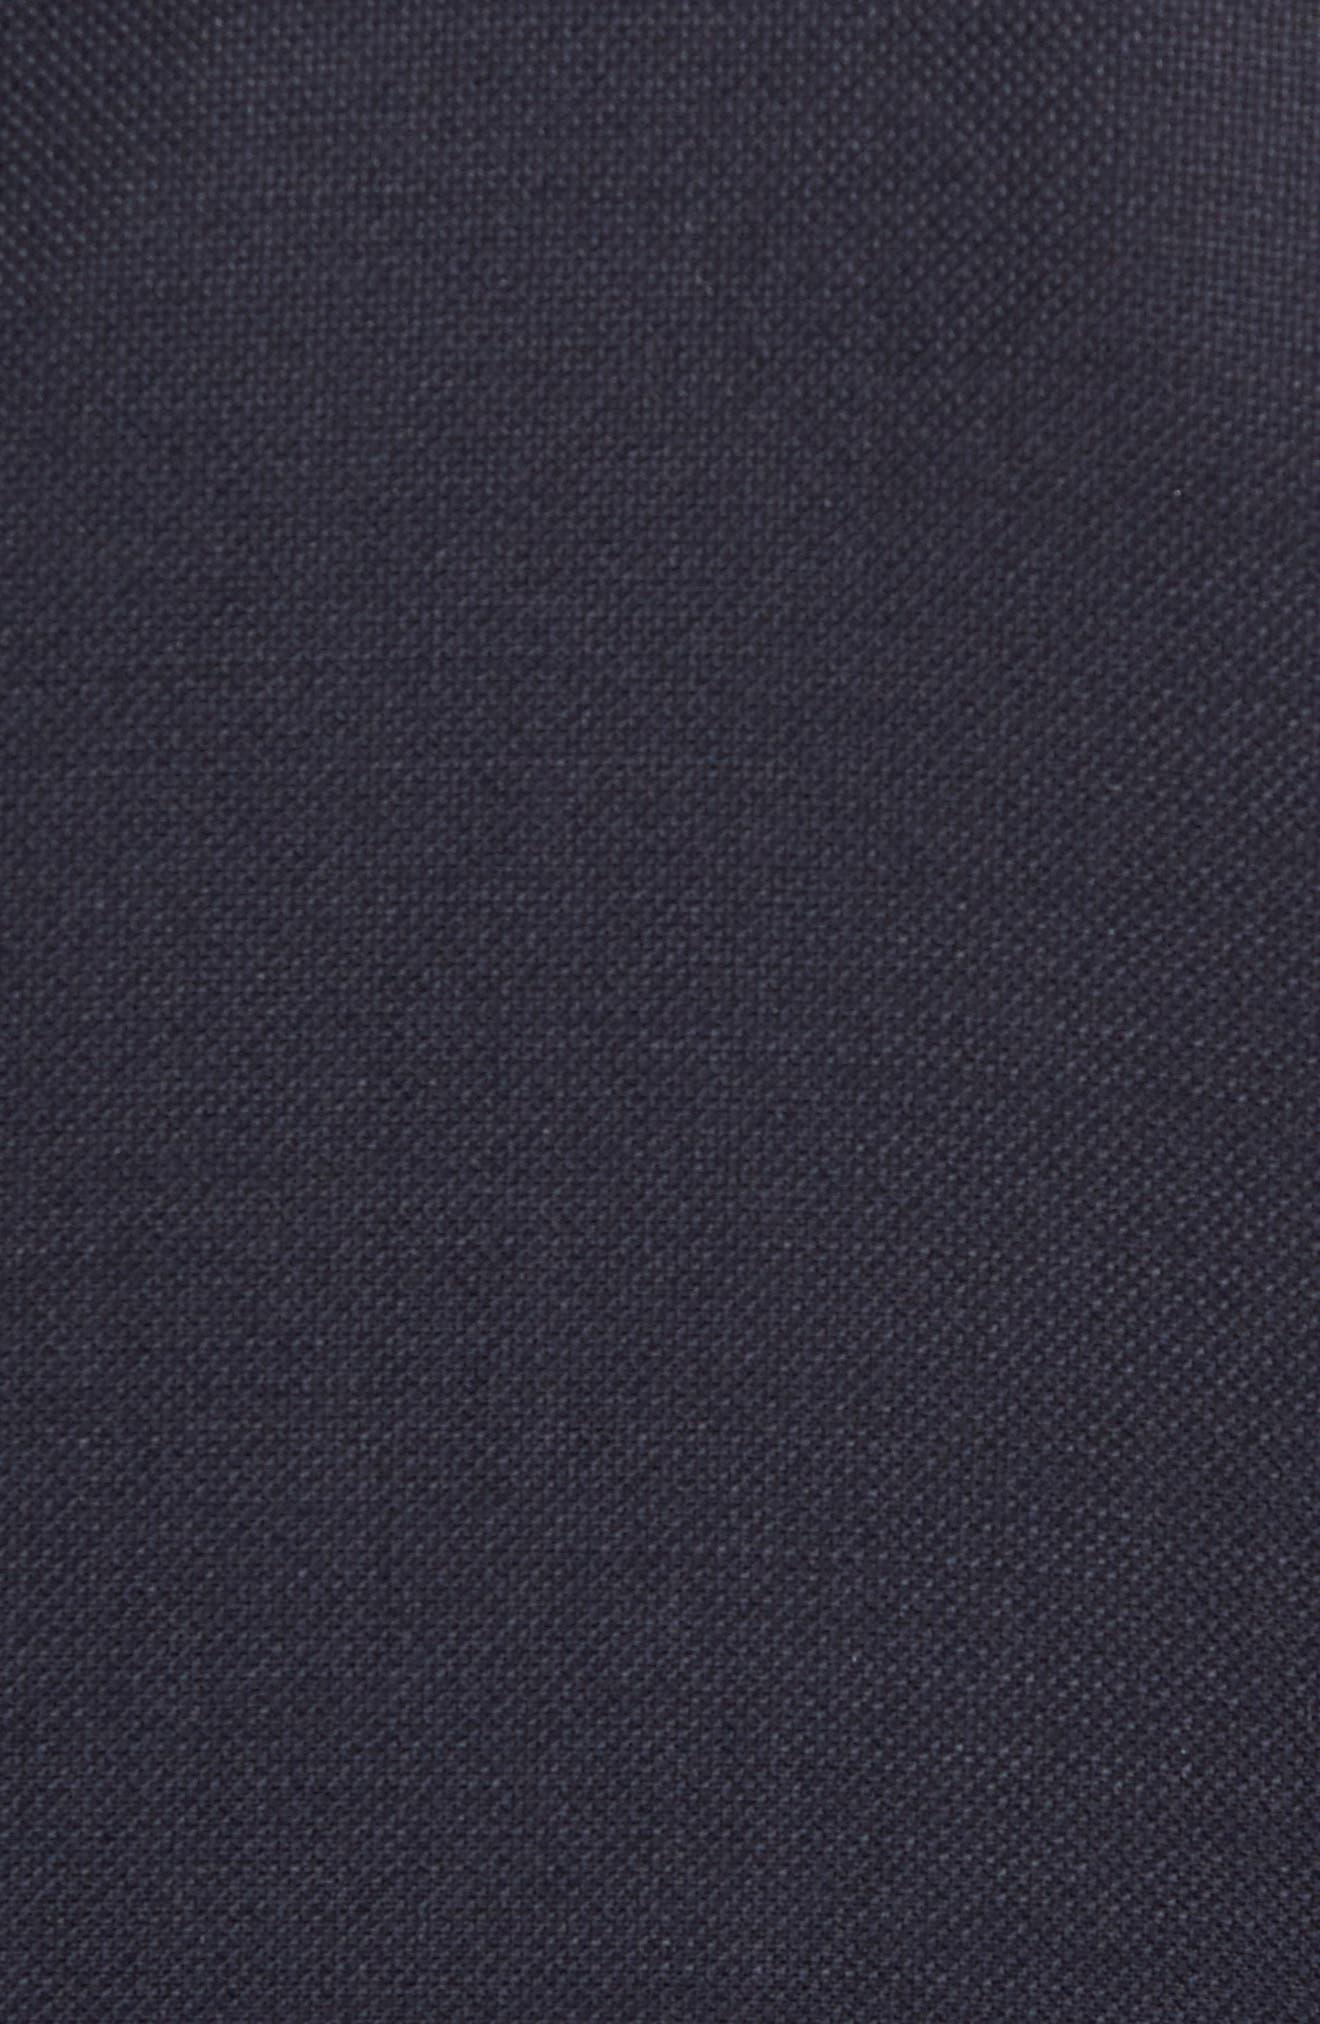 HART SCHAFFNER MARX, New York Classic Fit Wool Blend Blazer, Alternate thumbnail 7, color, NAVY